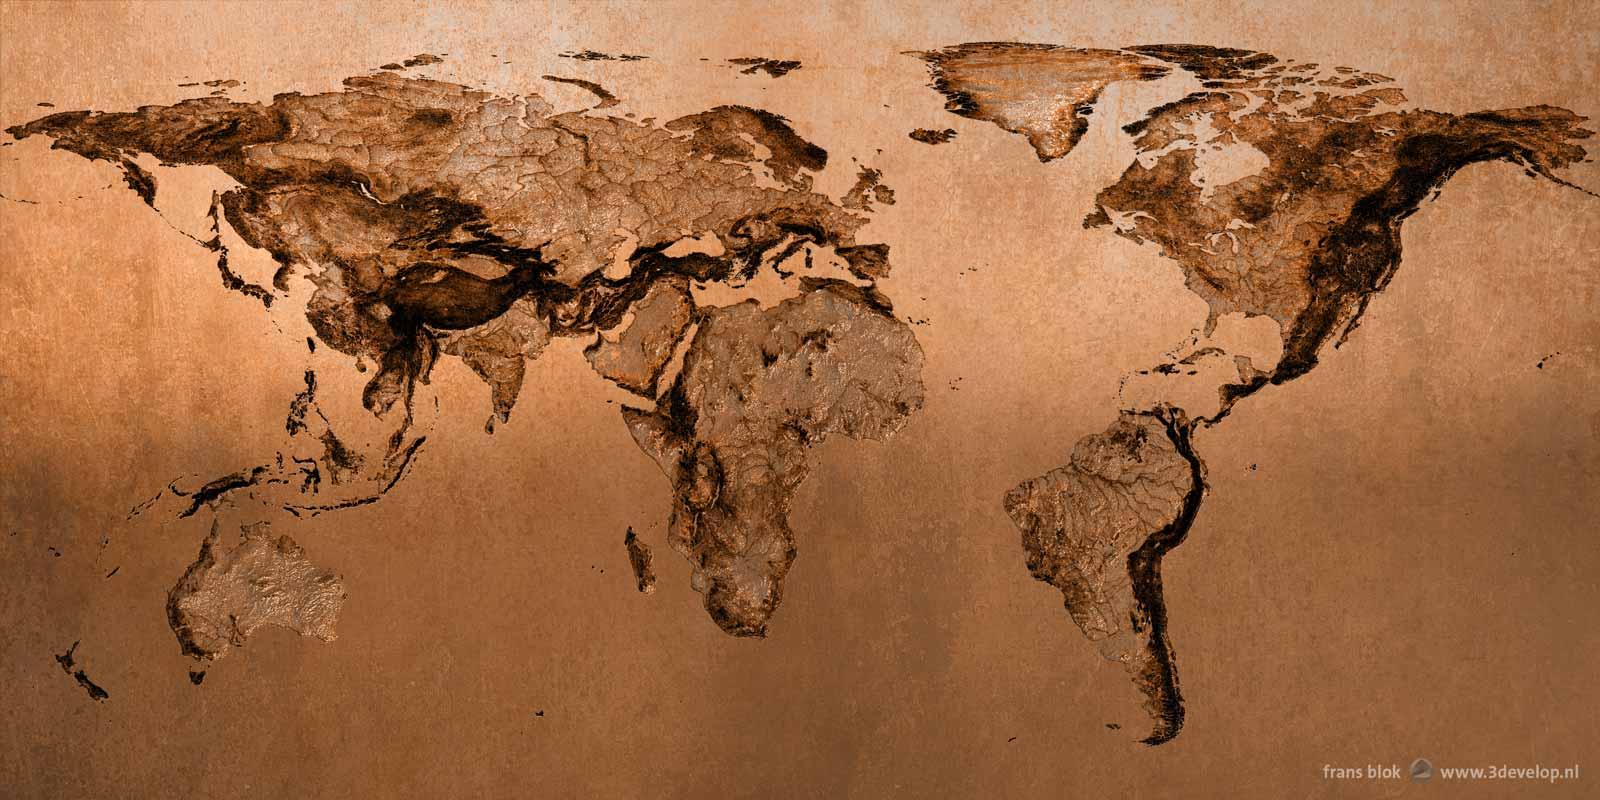 A mole's world view: a world map seen from below, mirrored, made in digital bronze